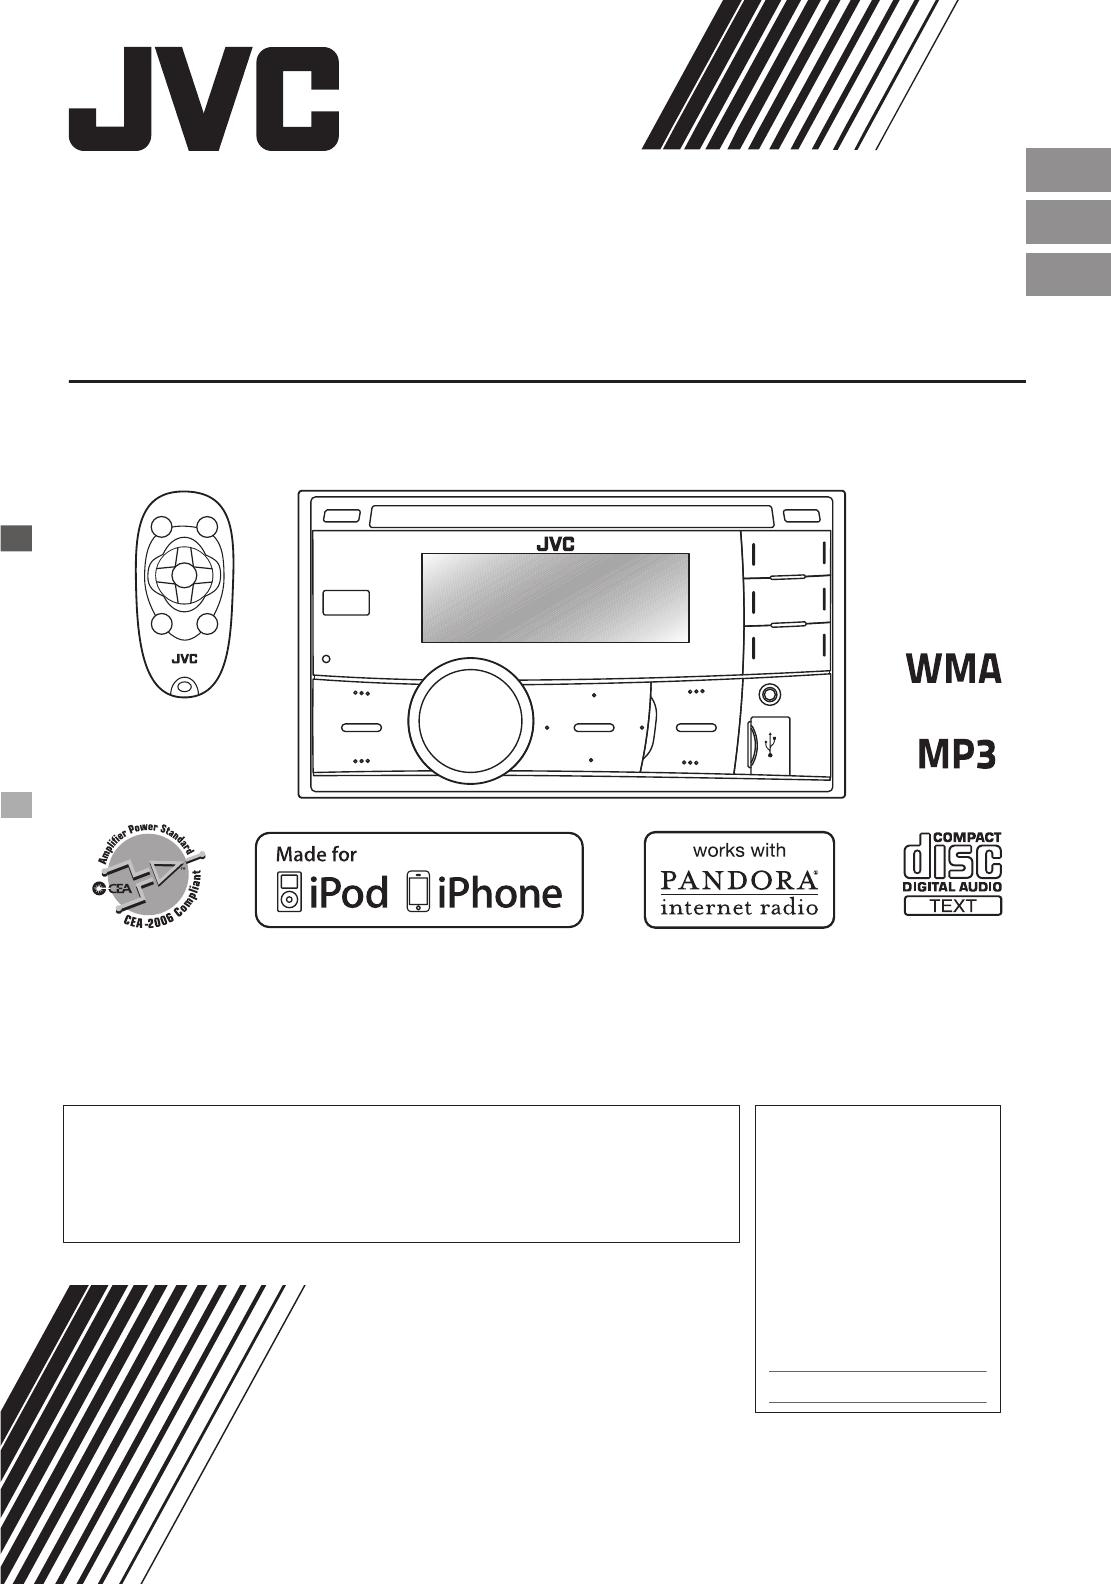 JVC KW-R500 manual | Jvc Kw R500 Car Stereo Wiring Diagram |  | ManualsCat.com